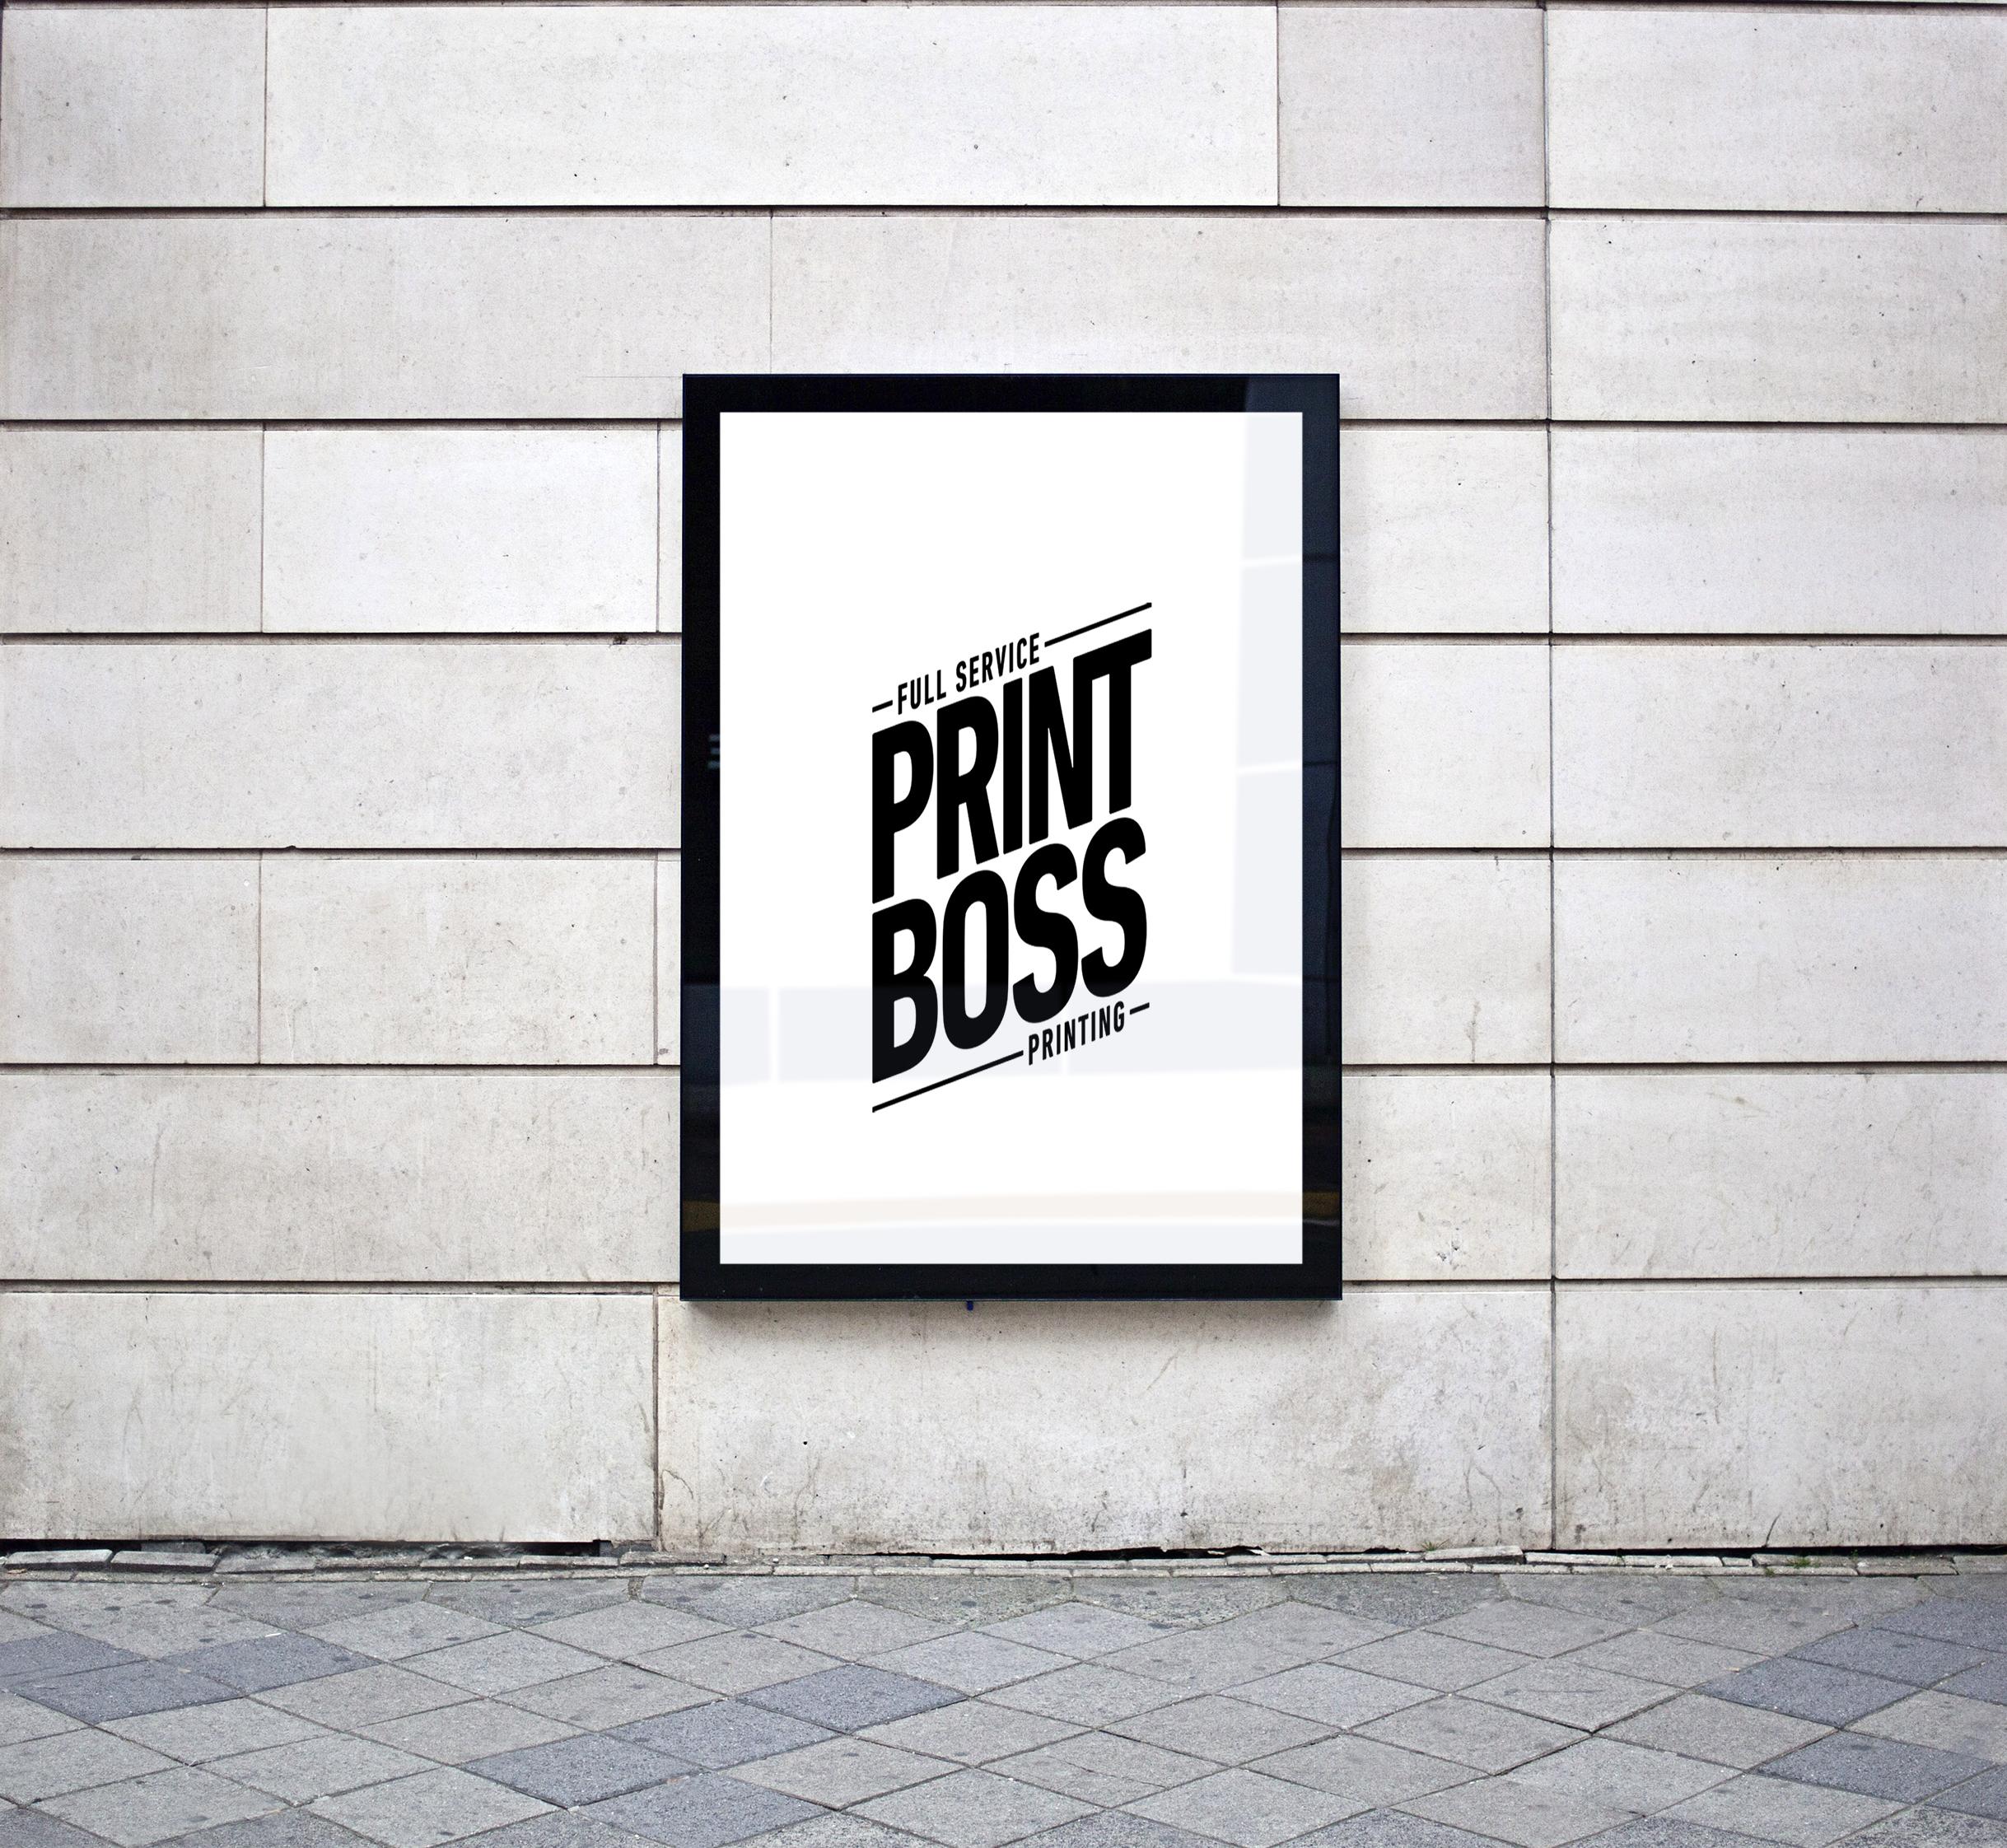 posterprintboss.jpg